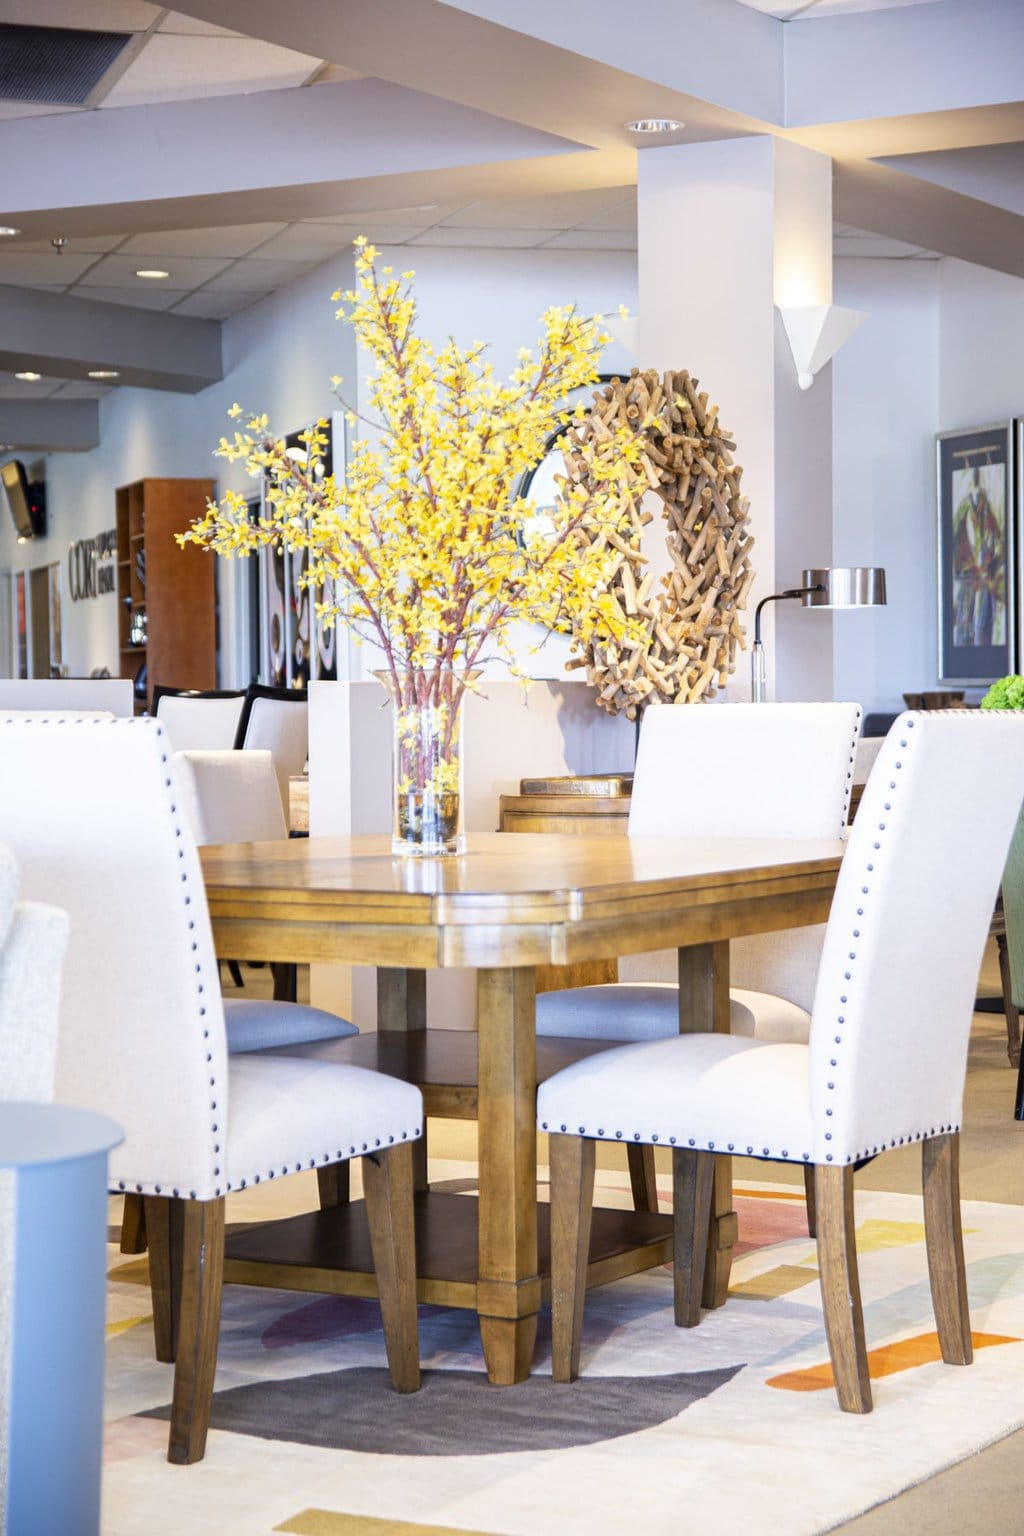 Rental decorating tips from the CORT furniture rental showroom in Atlanta, GA on Thou Swell #cort #cortfurniture #furniturerental #furnitureshowroom #showroom